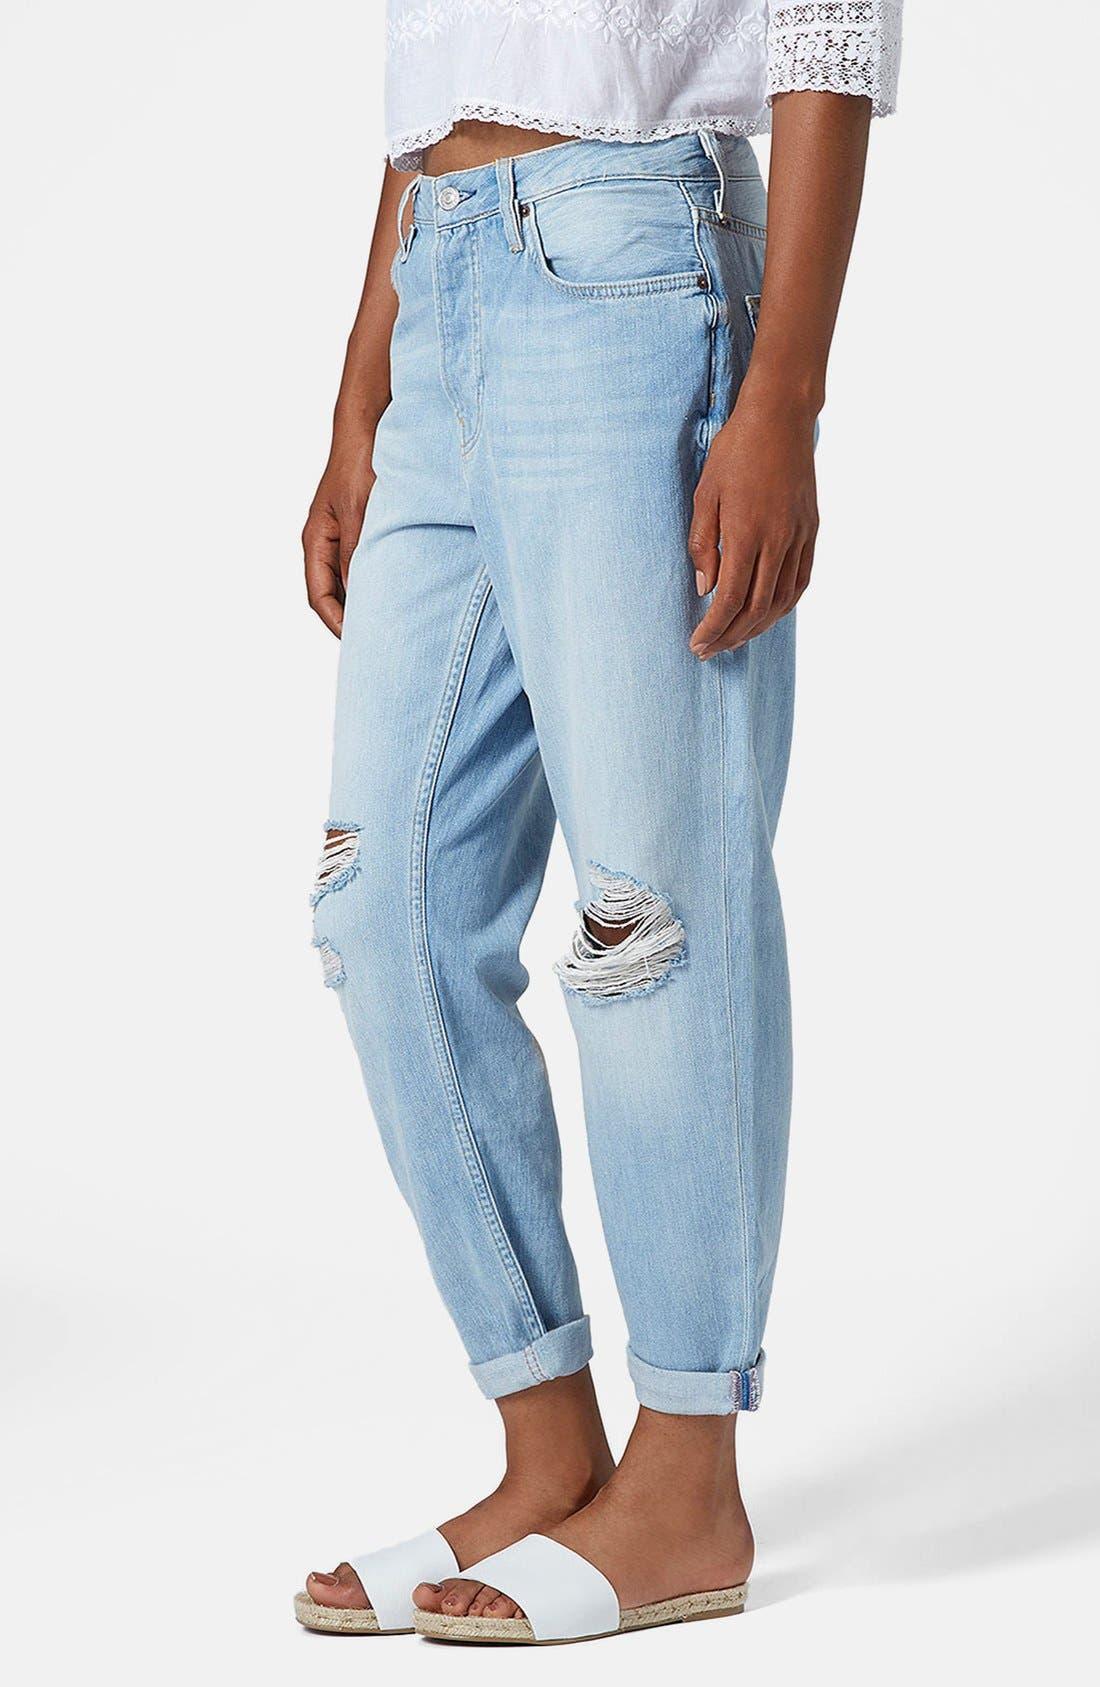 Alternate Image 1 Selected - Topshop Moto 'Hayden' Frayed Boyfriend Jeans (Bleach Stone)